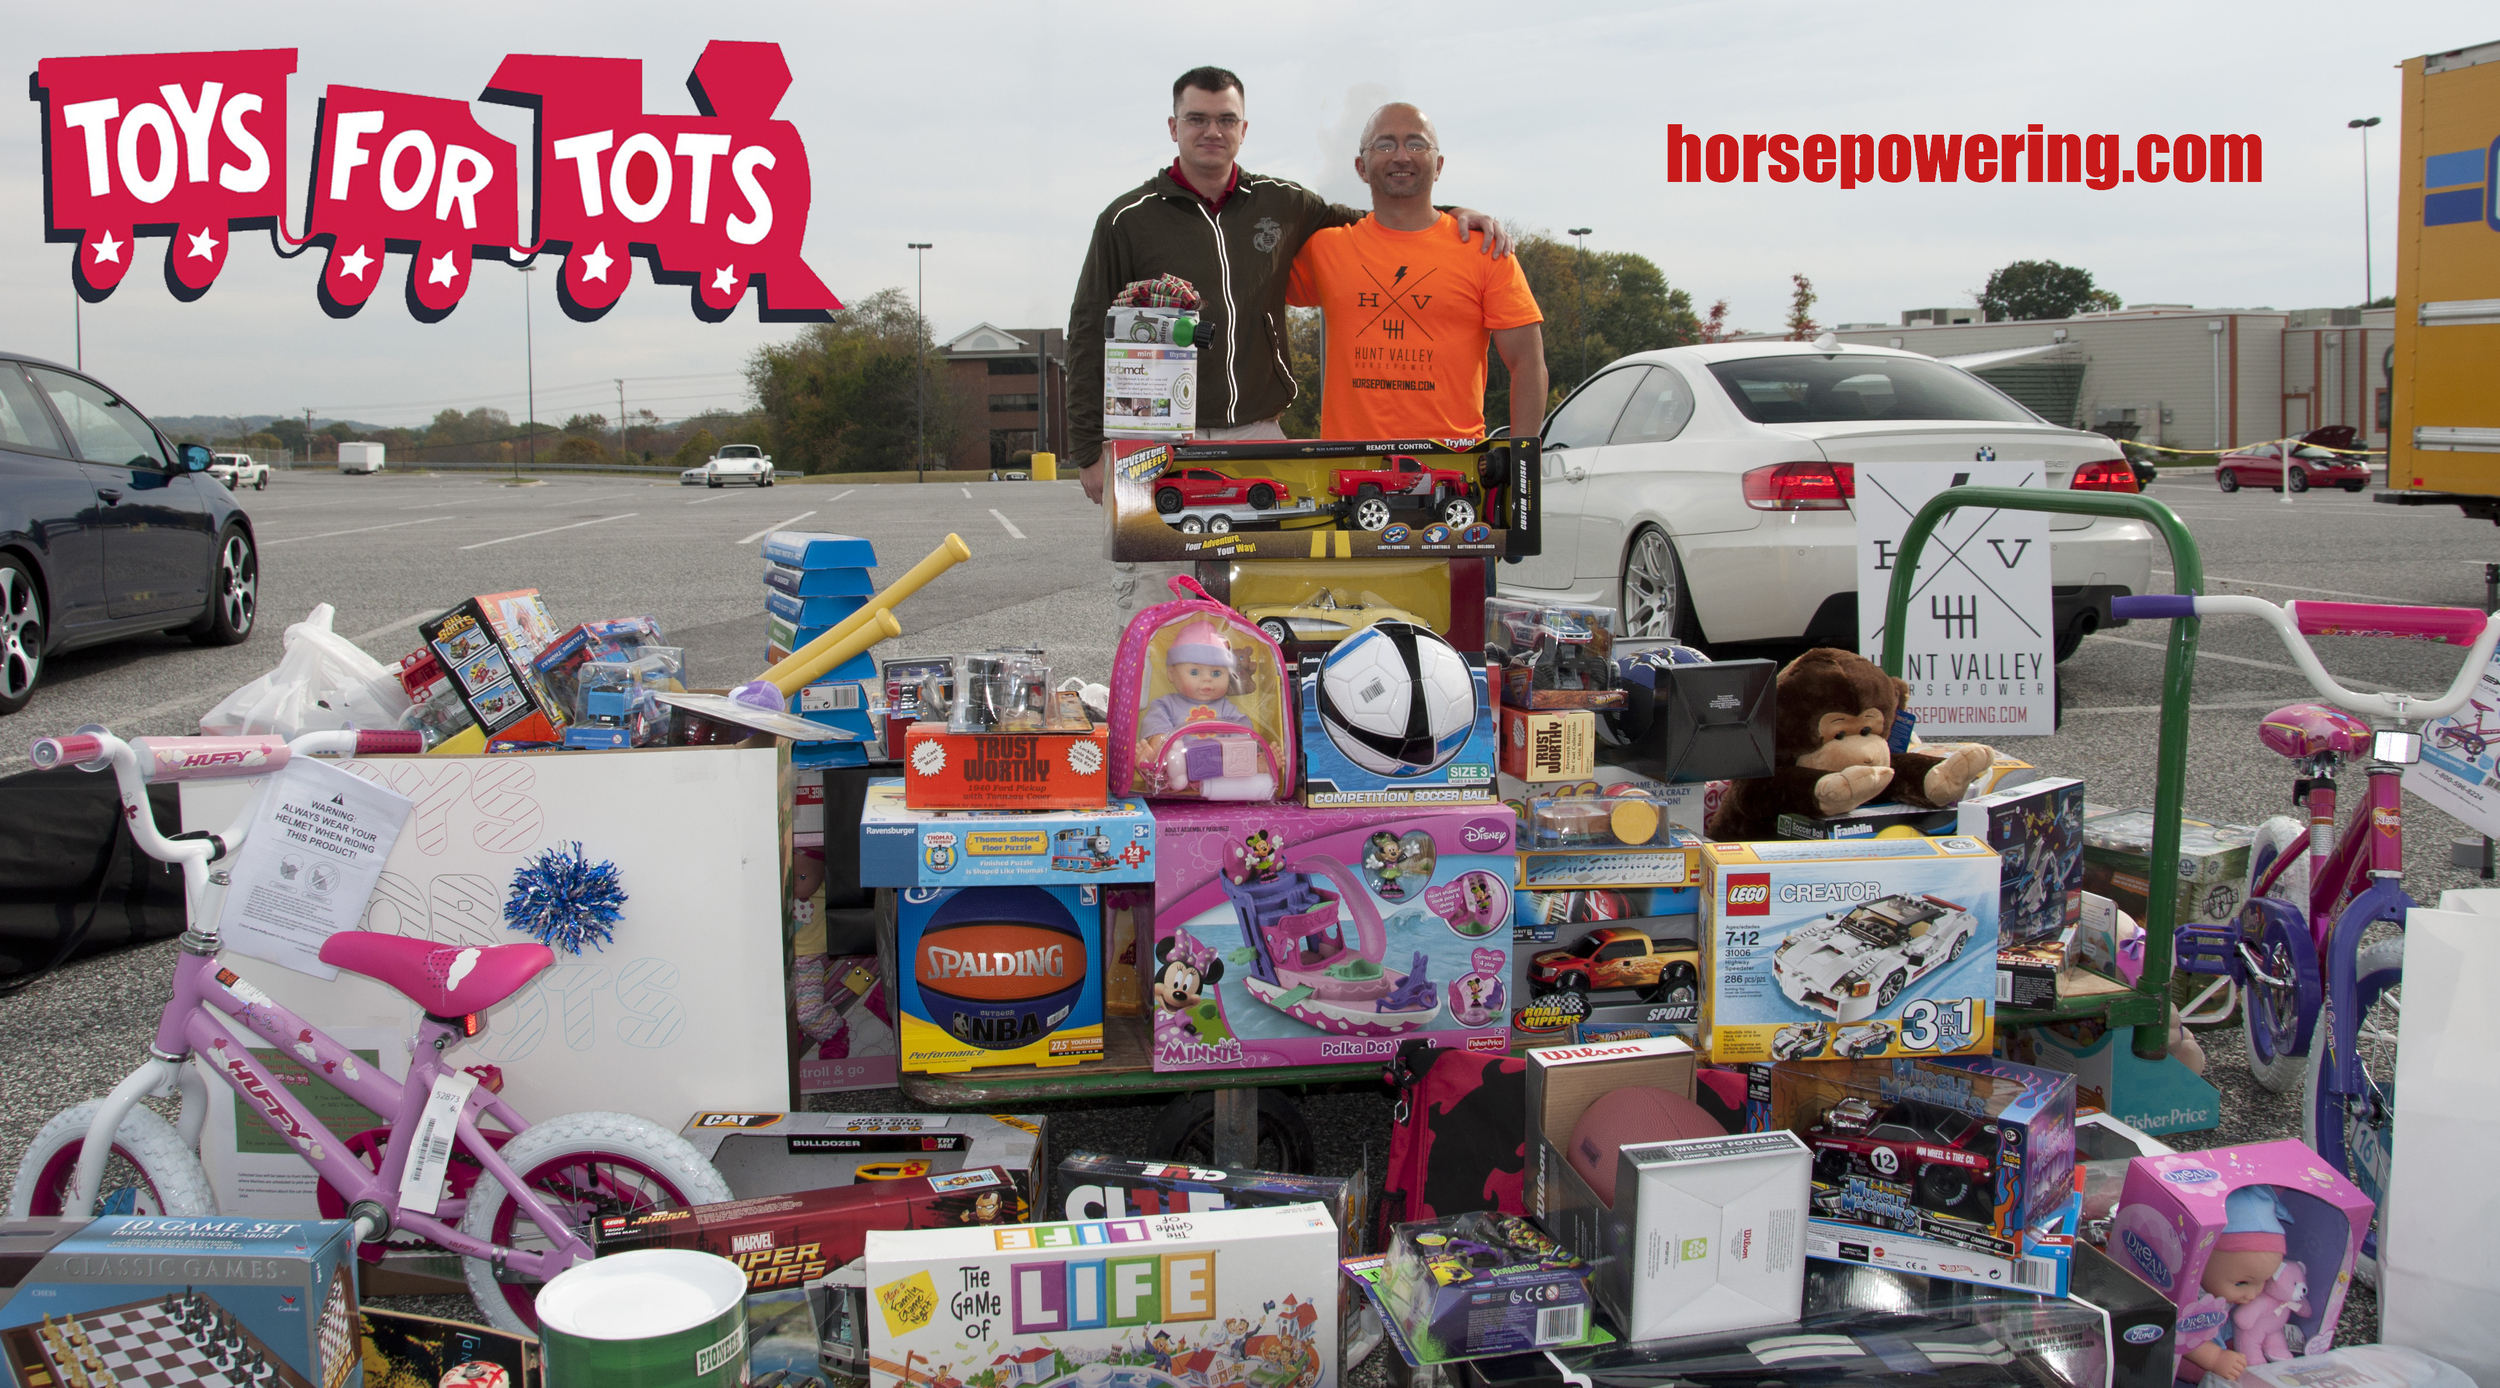 Toys For Tots Loading U-Haul + TFT HP.jpg